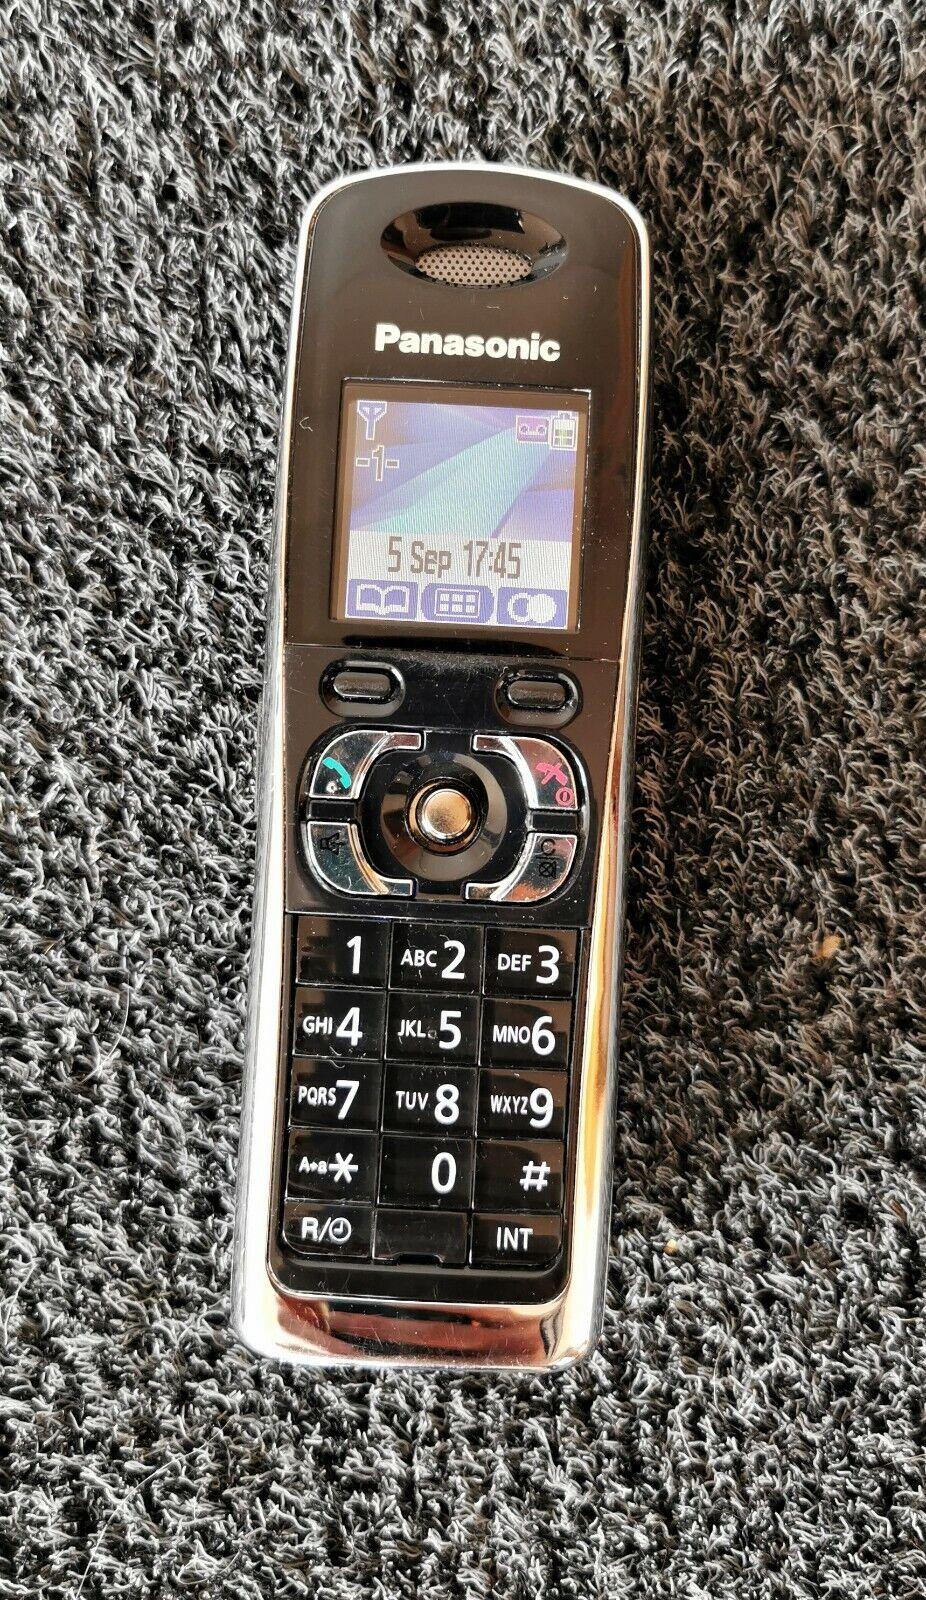 Panasonic Funktelefon KX-TG8321G B - guter Zustand - Leasingrückläufer...